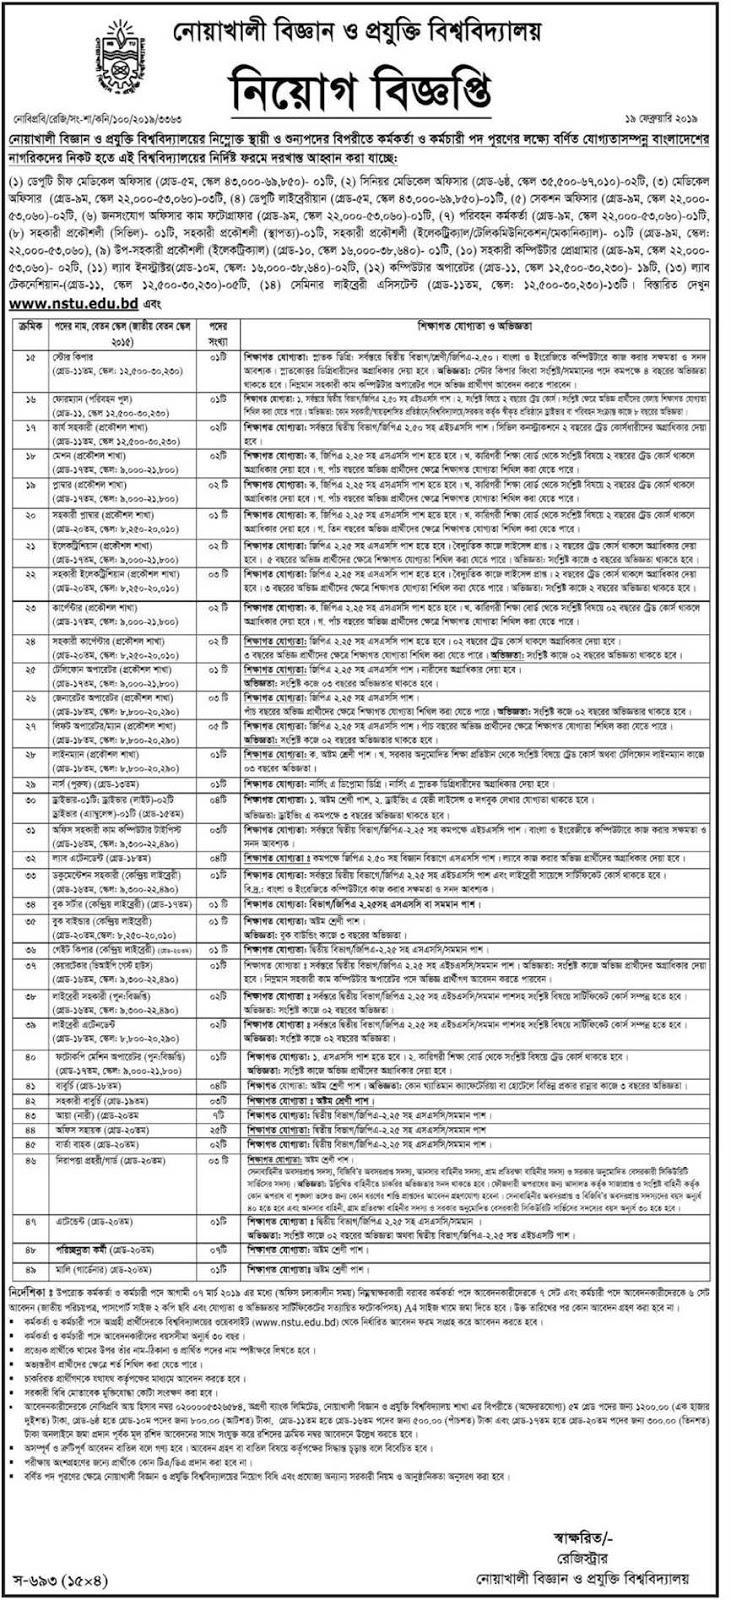 Noakhali Science and Technology University Published Job Circular